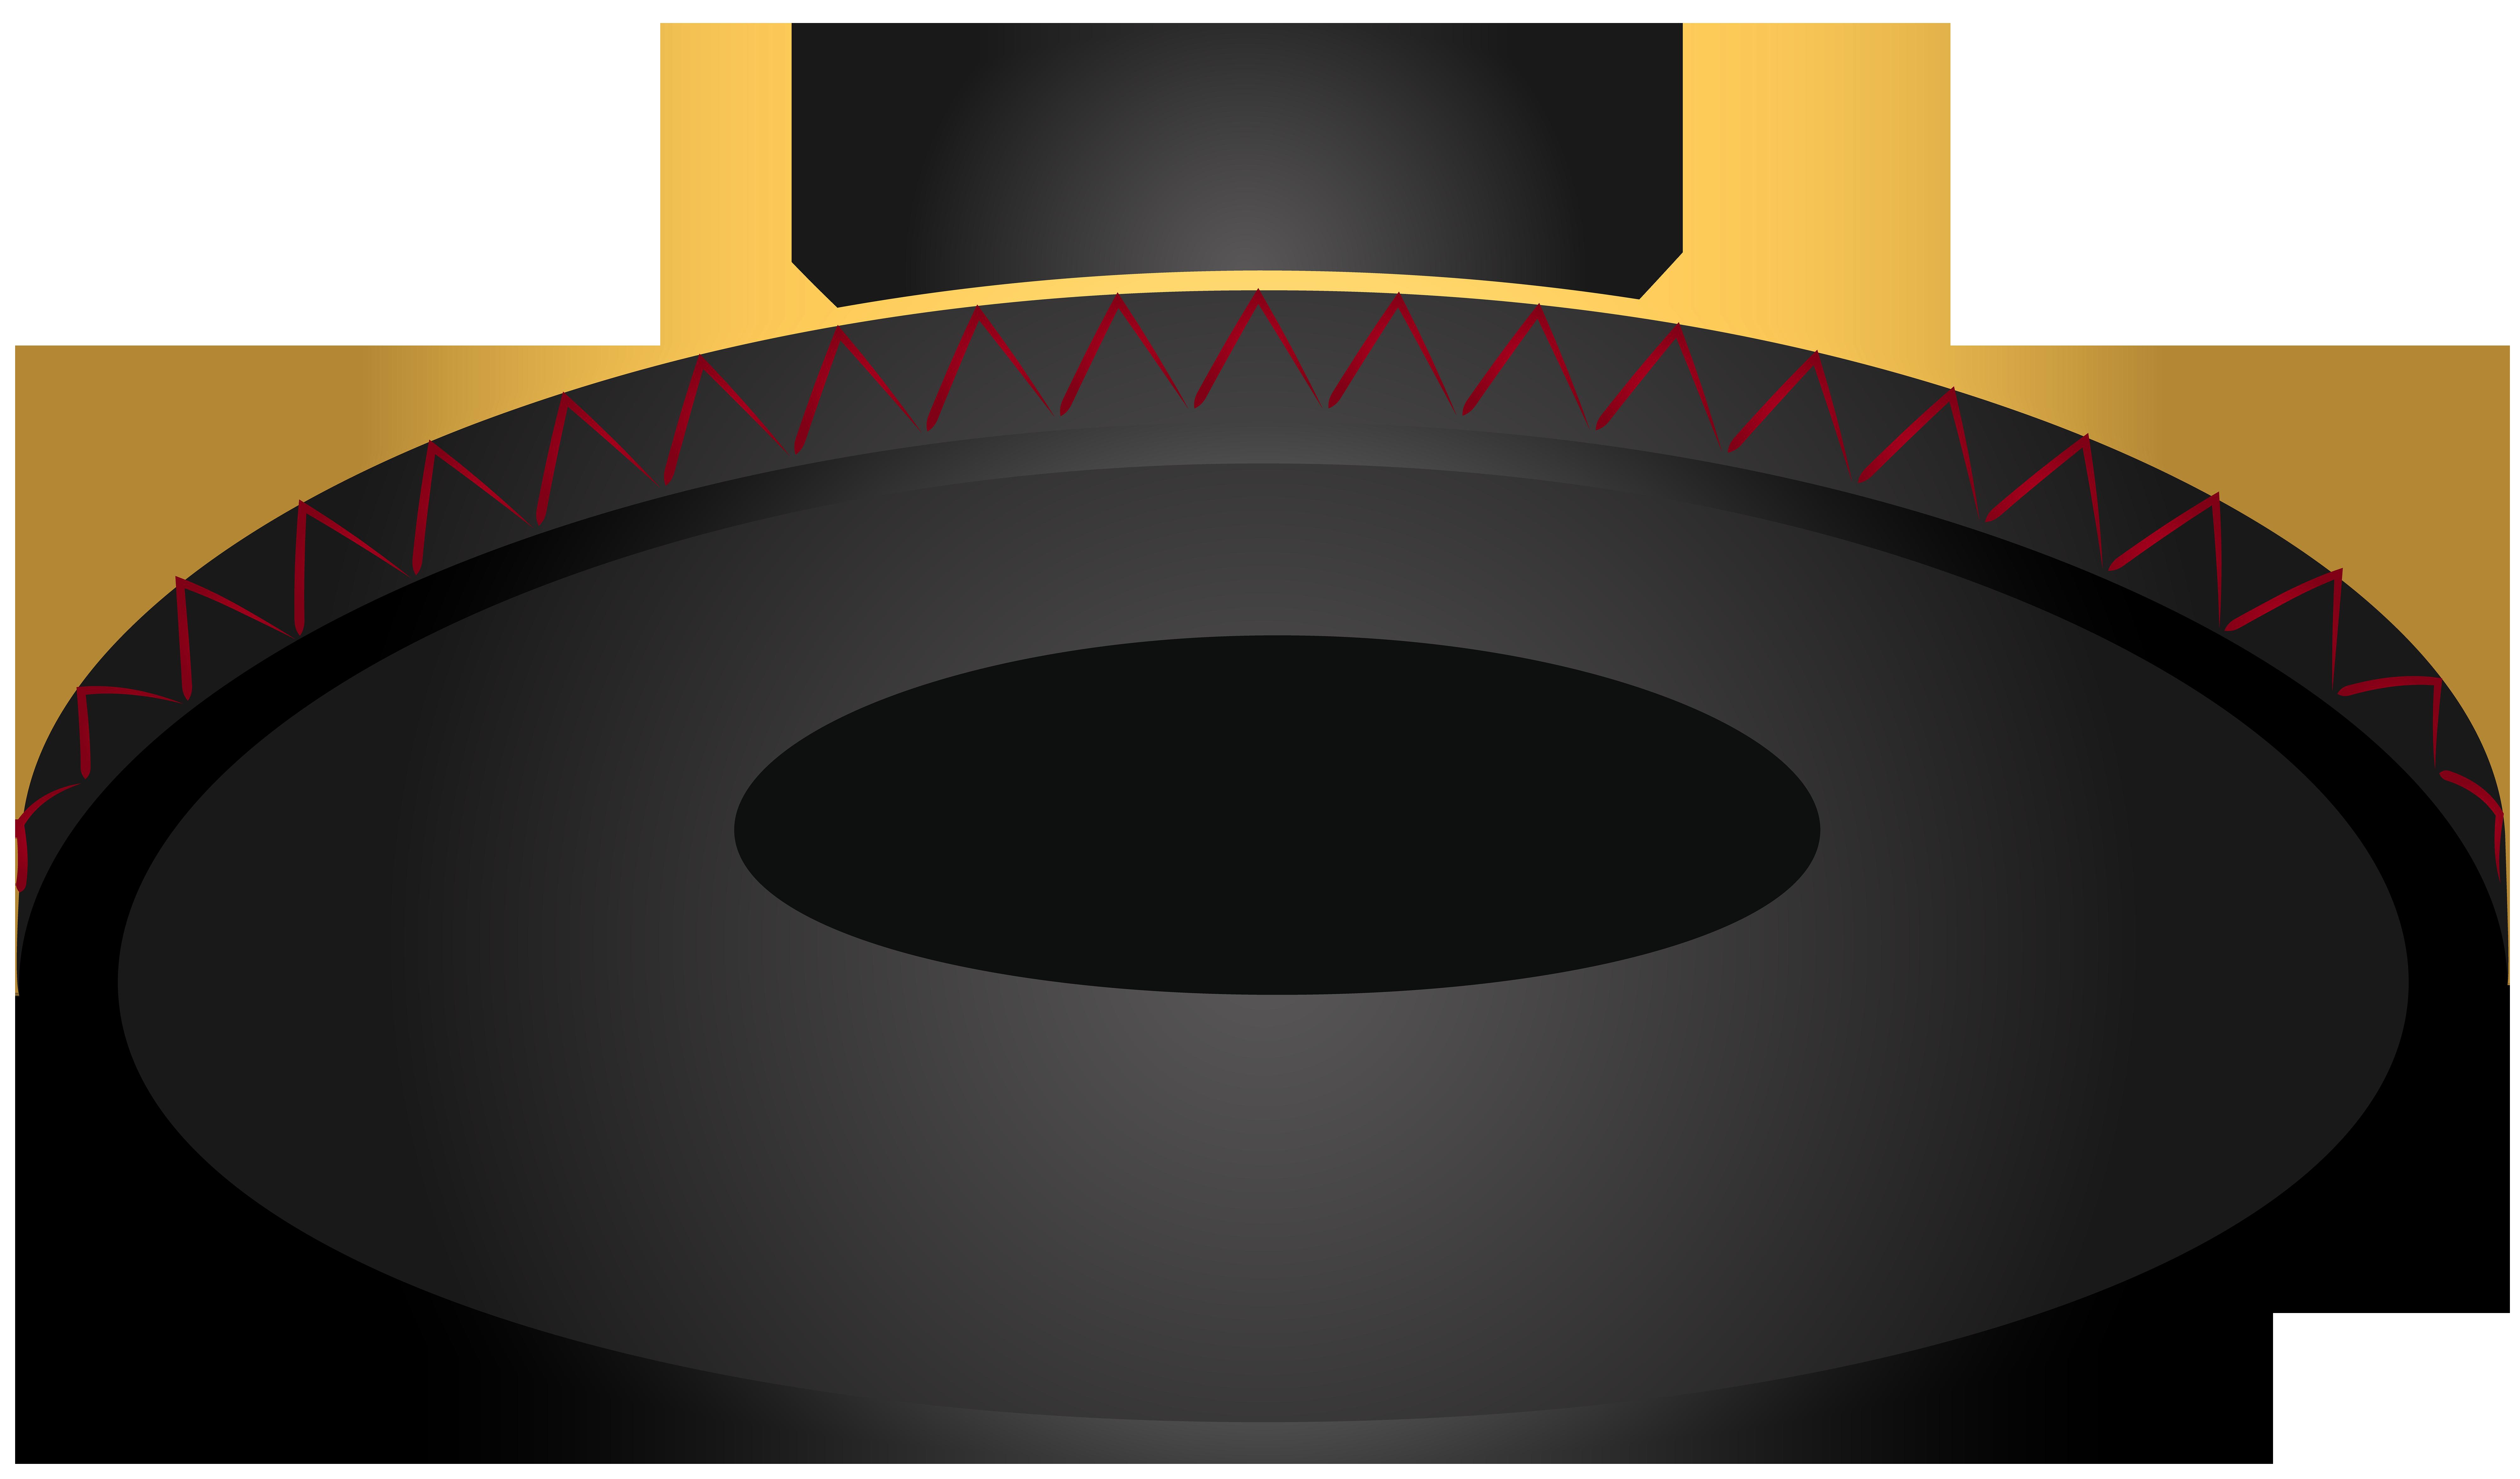 8000x4696 Black Spanish Hat Png Clip Art Imageu200b Gallery Yopriceville